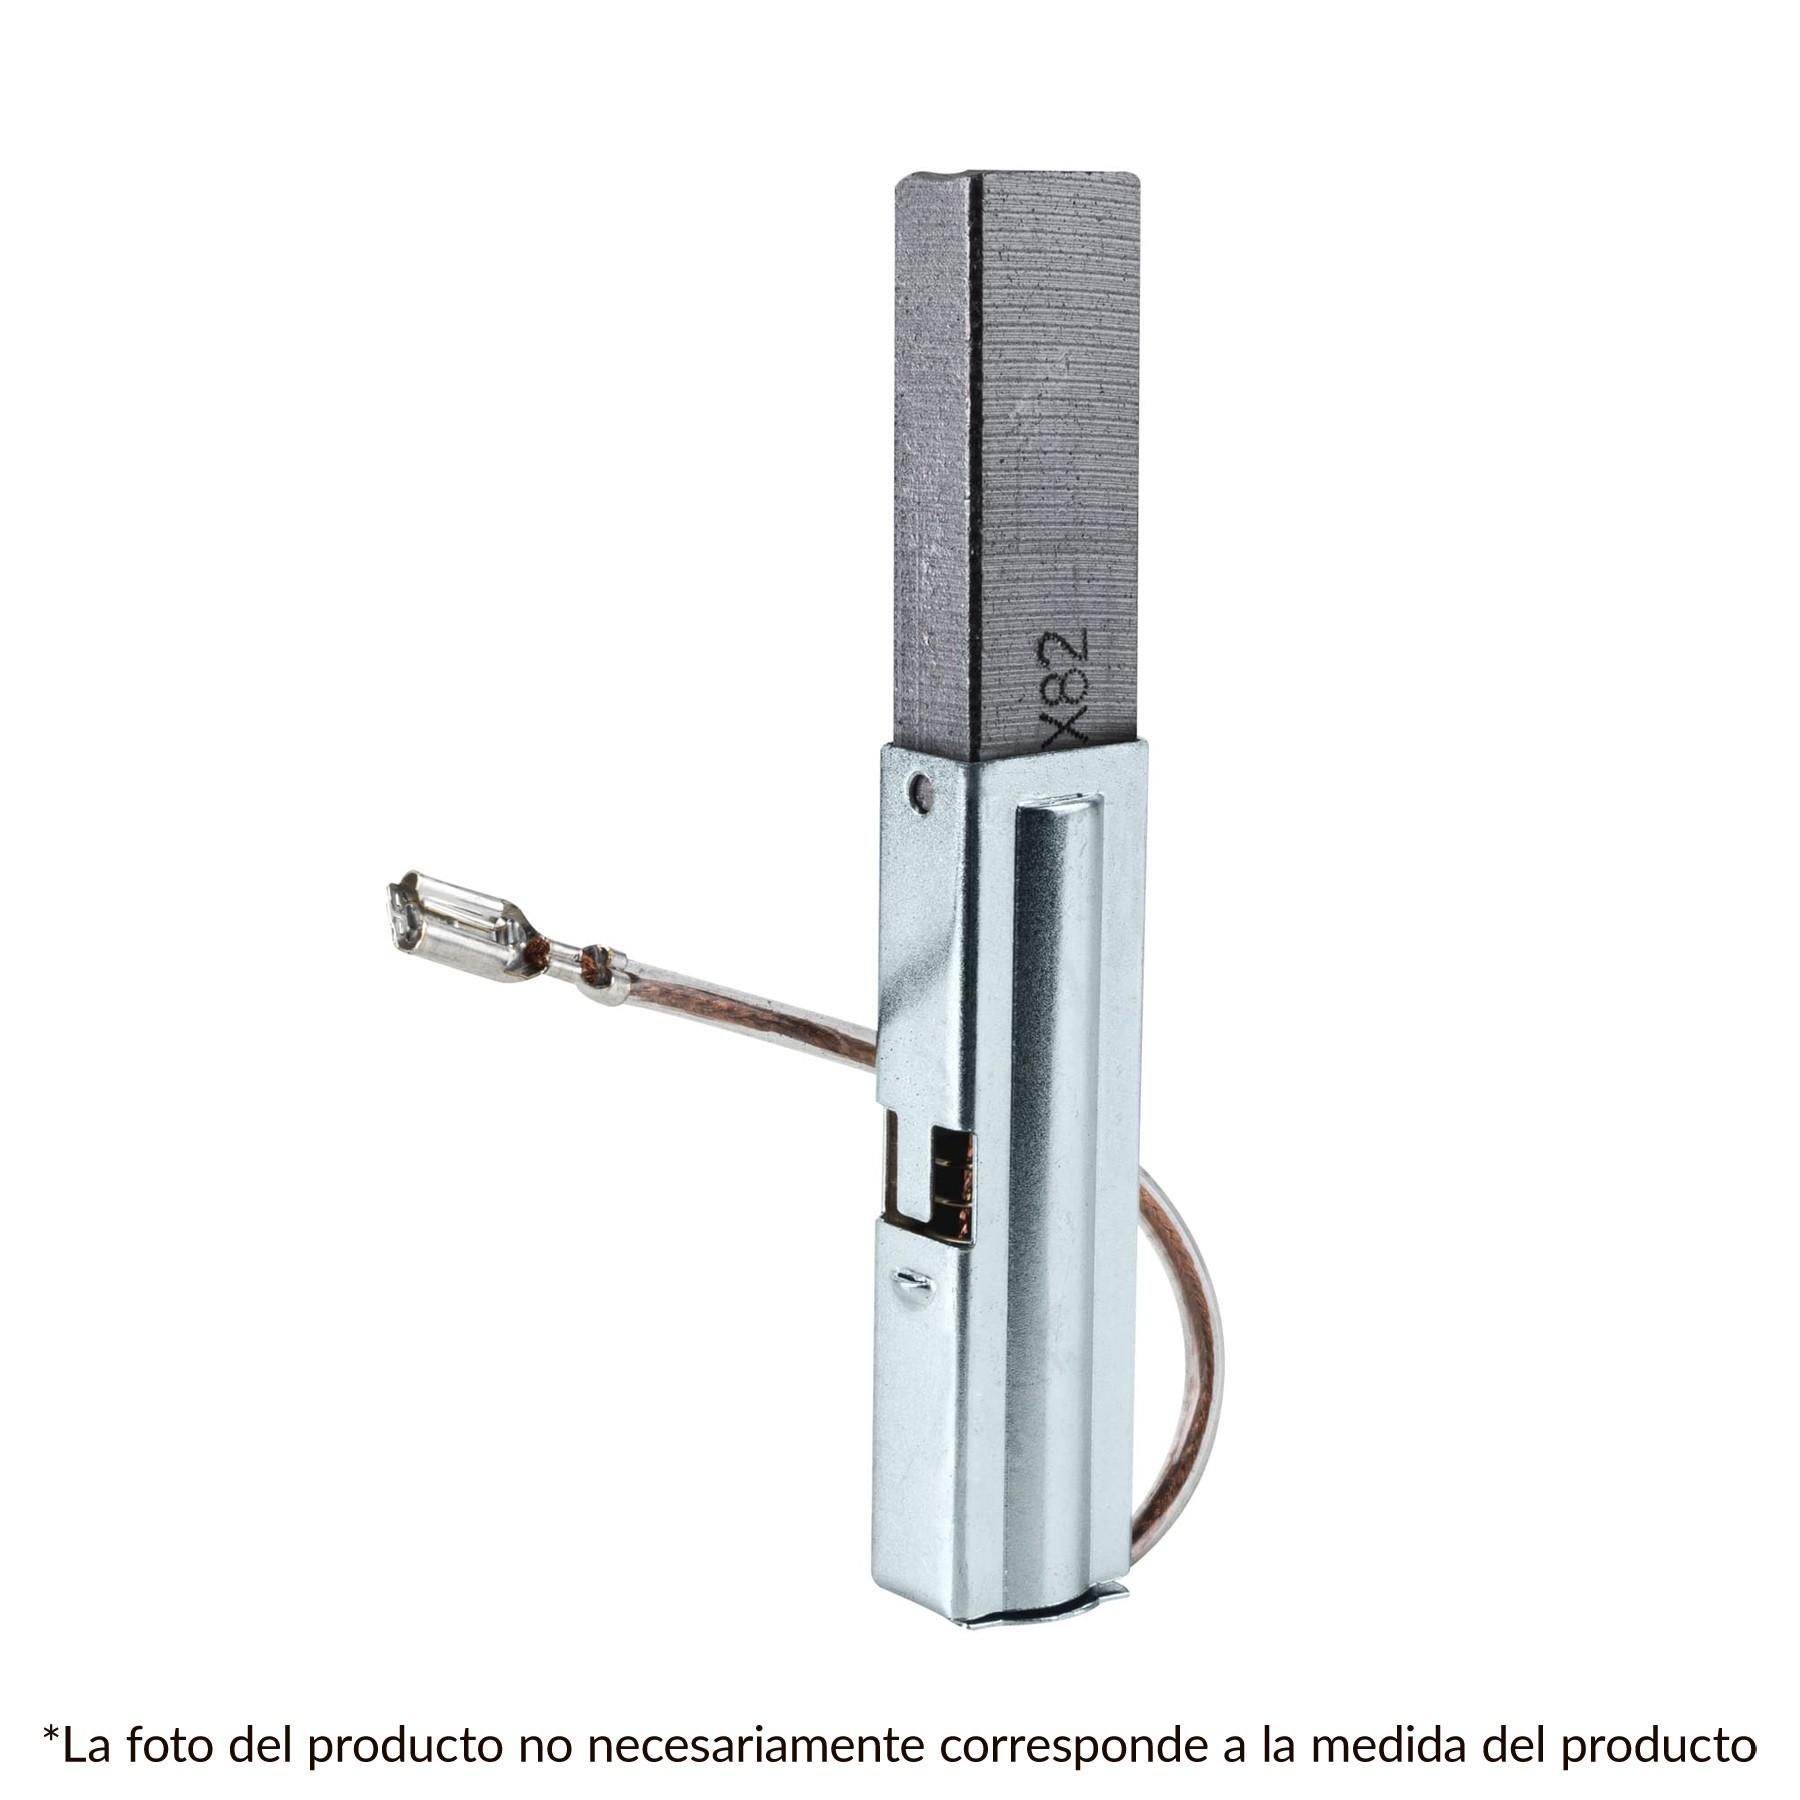 Carbones de repuesto para aspiradora ASPI-16X